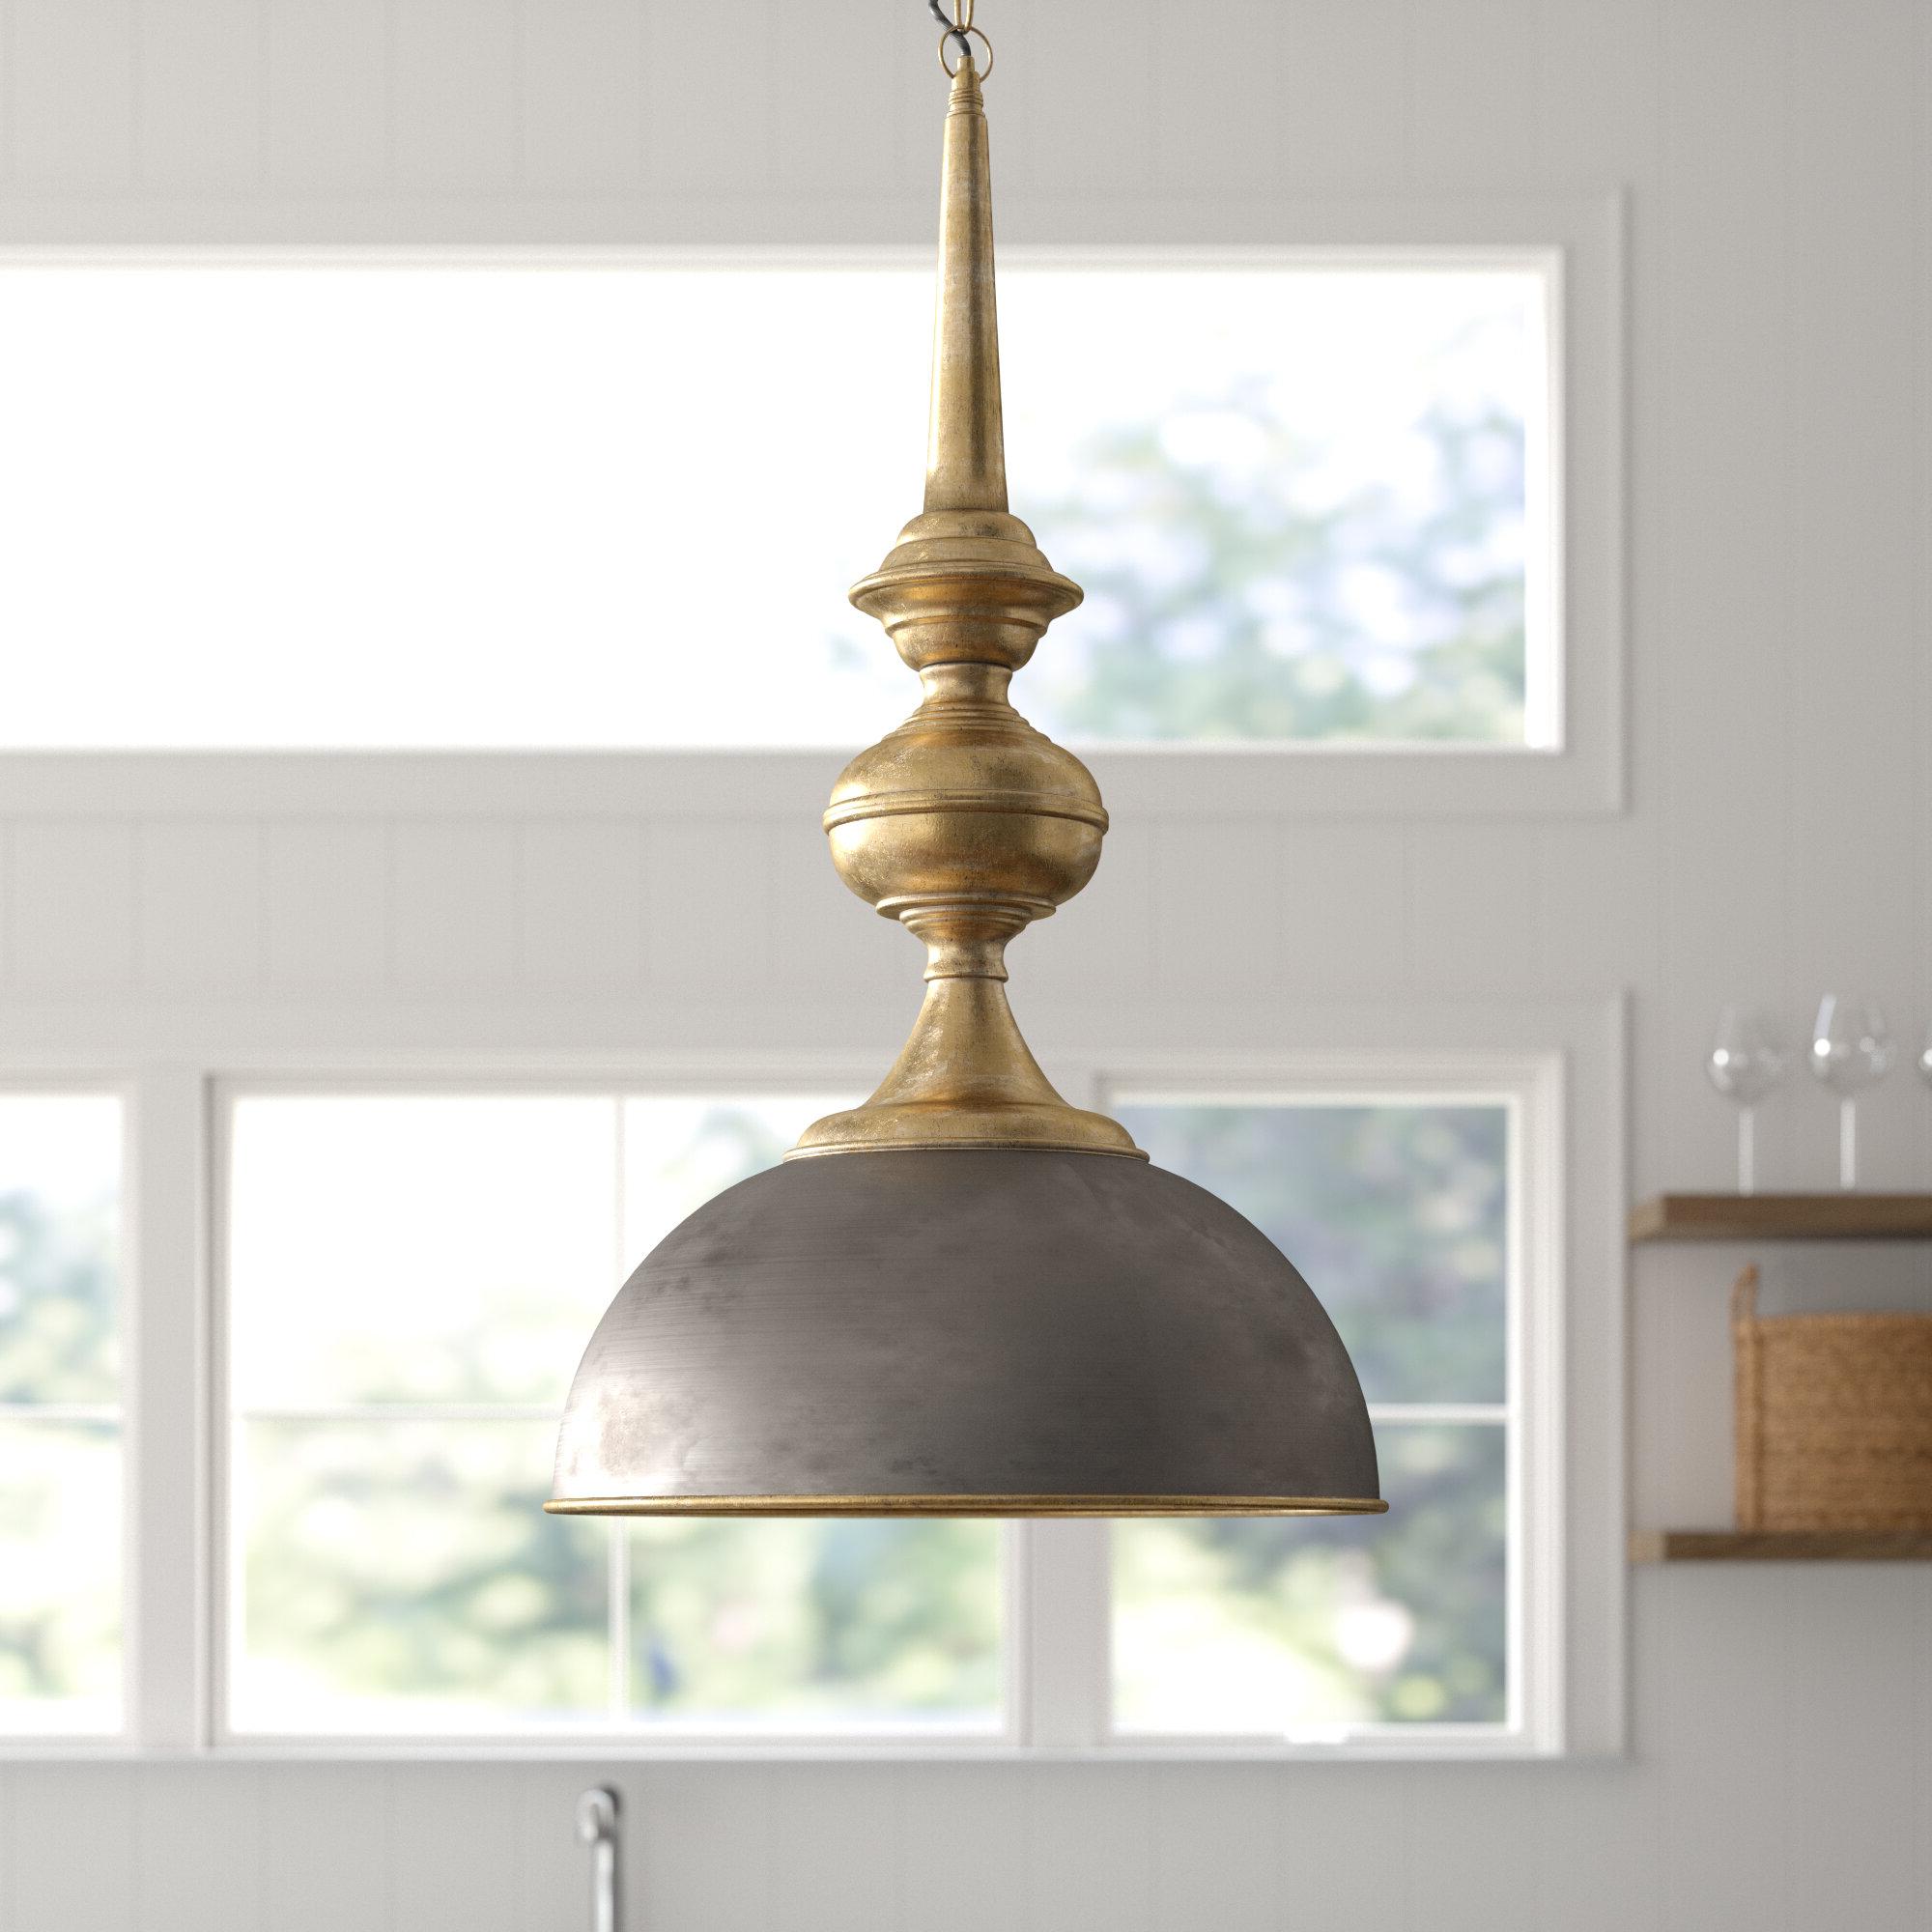 Bainbridge 1-Light Single Cylinder Pendants inside Best and Newest Corrine 1-Light Single Dome Pendant